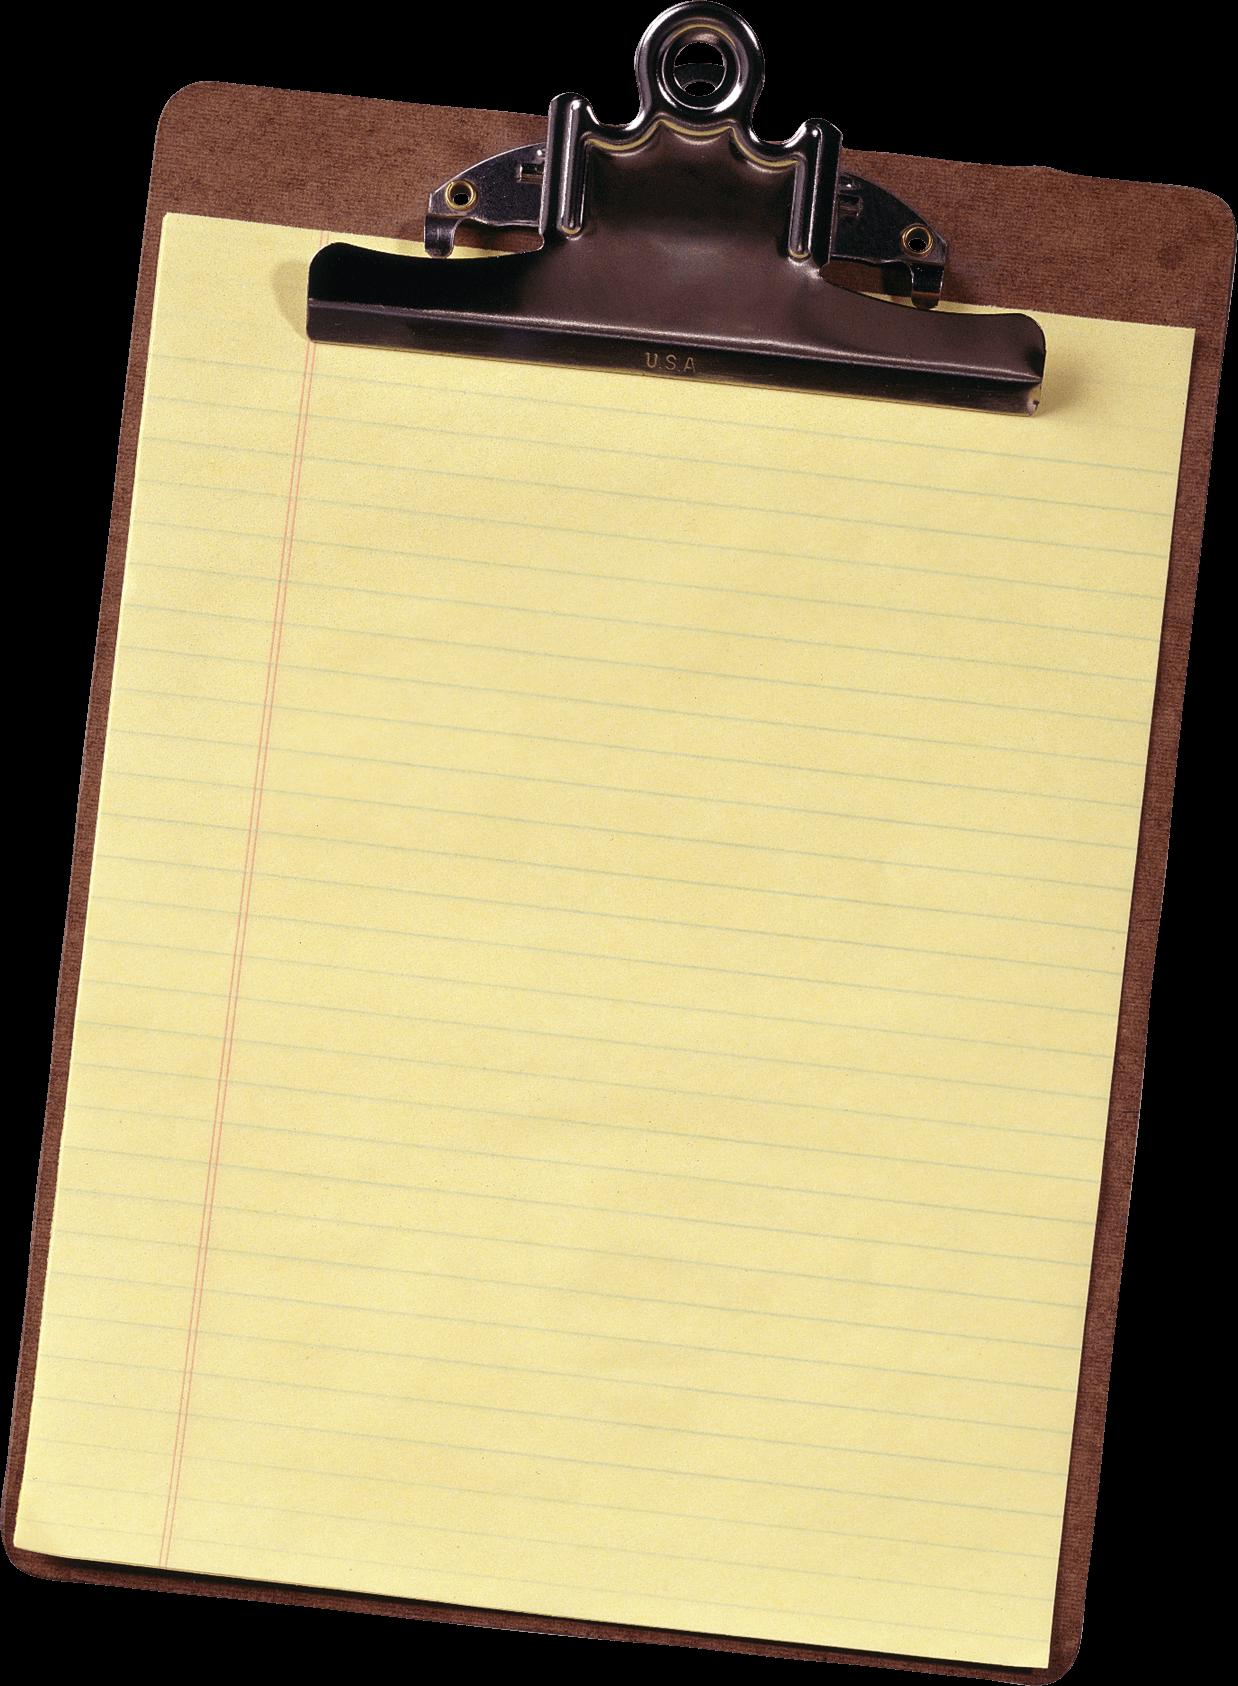 Holder paper sheet png. Clipboard clipart transparent background